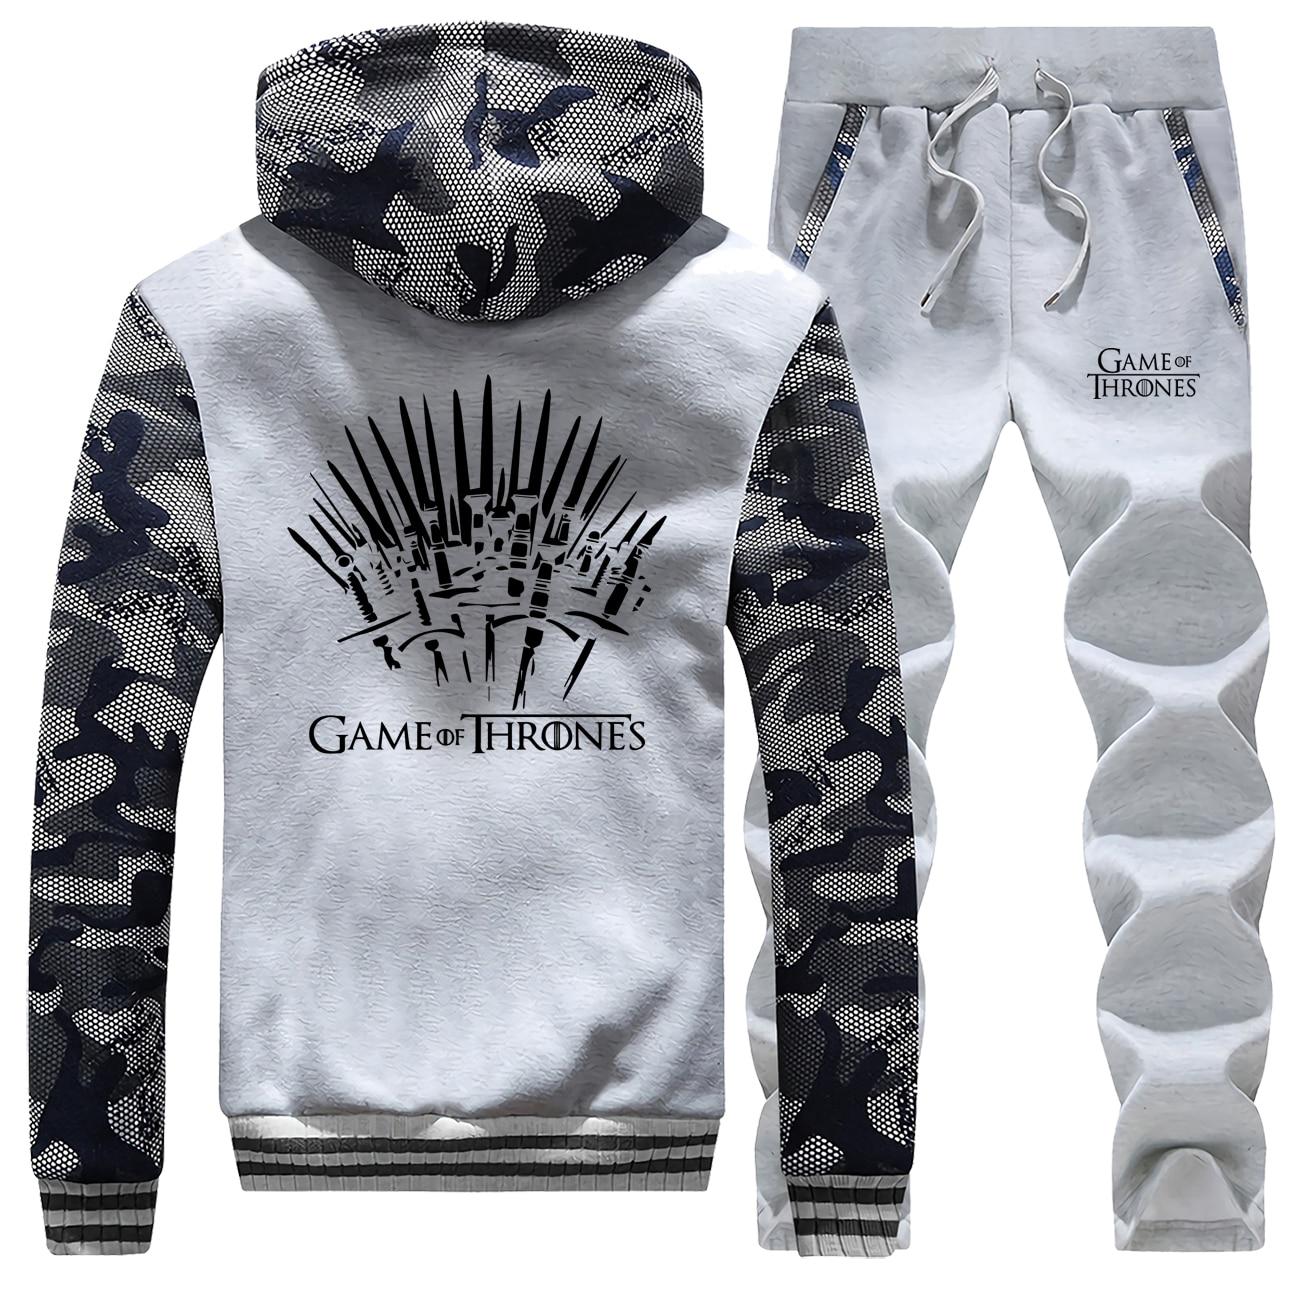 Game Of Thrones Camouflage Thick Hoodies Sweatshirt+pants 2 Piece Sets Men Fleece Hoodie Fashion Brand Mens Winter Jacket Suit